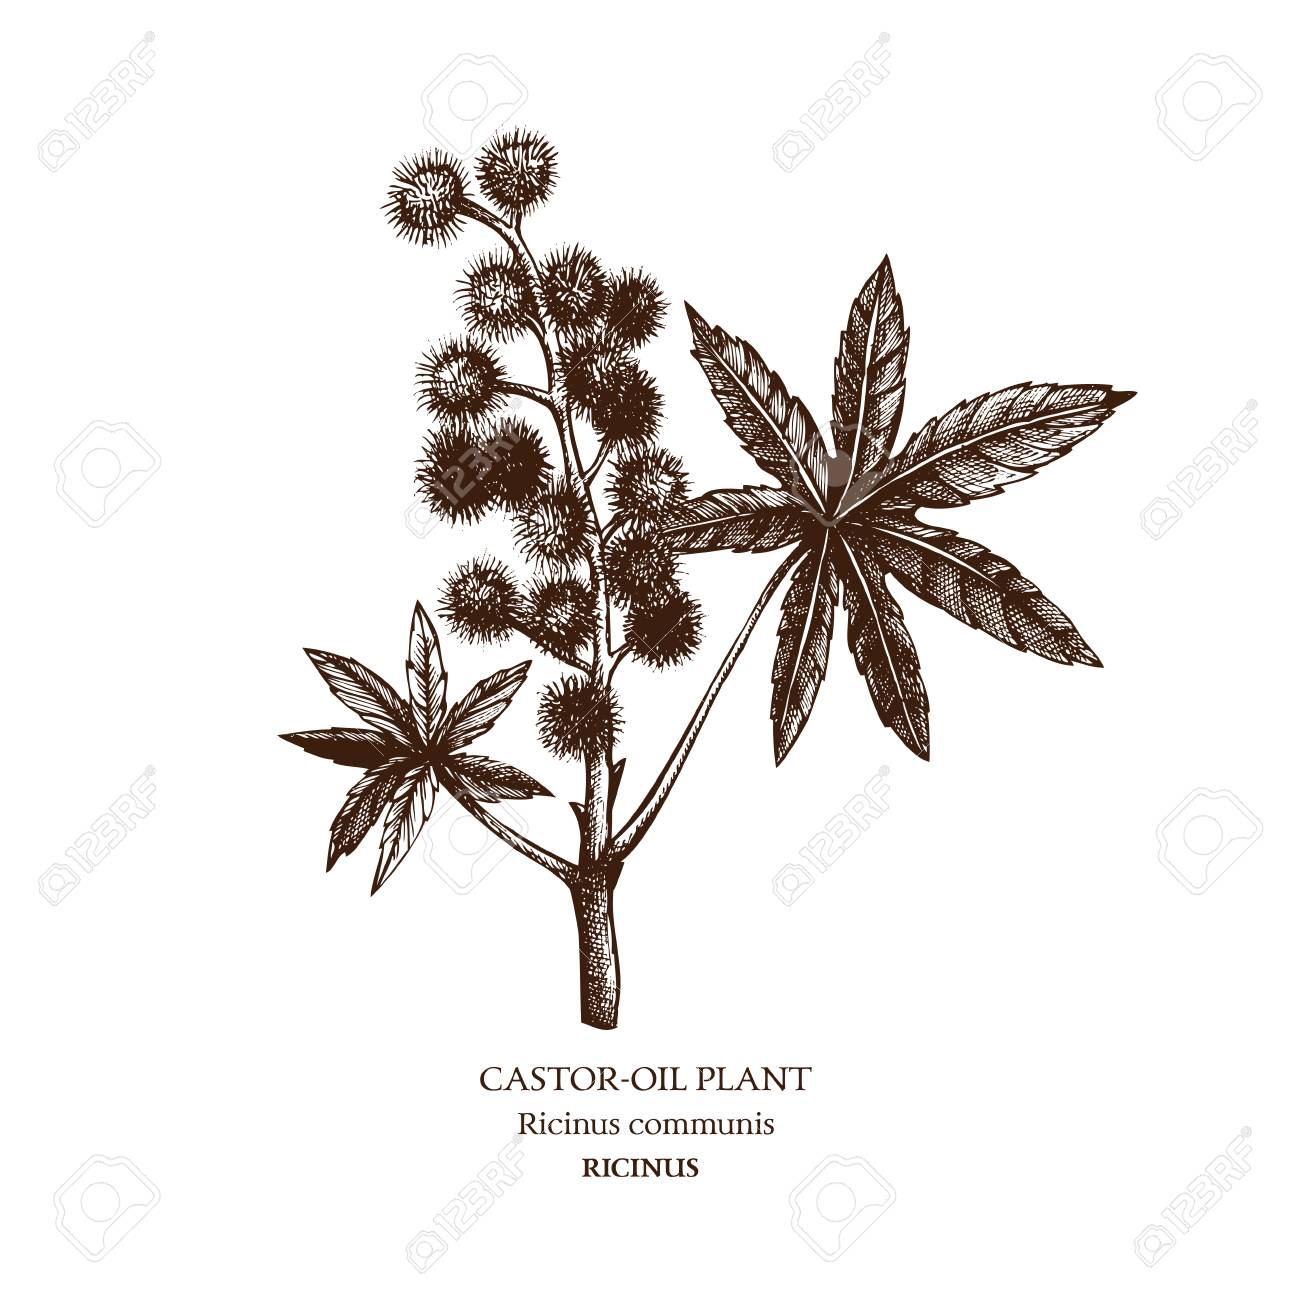 Botanical illustration of Castor oil plant. - 77521899